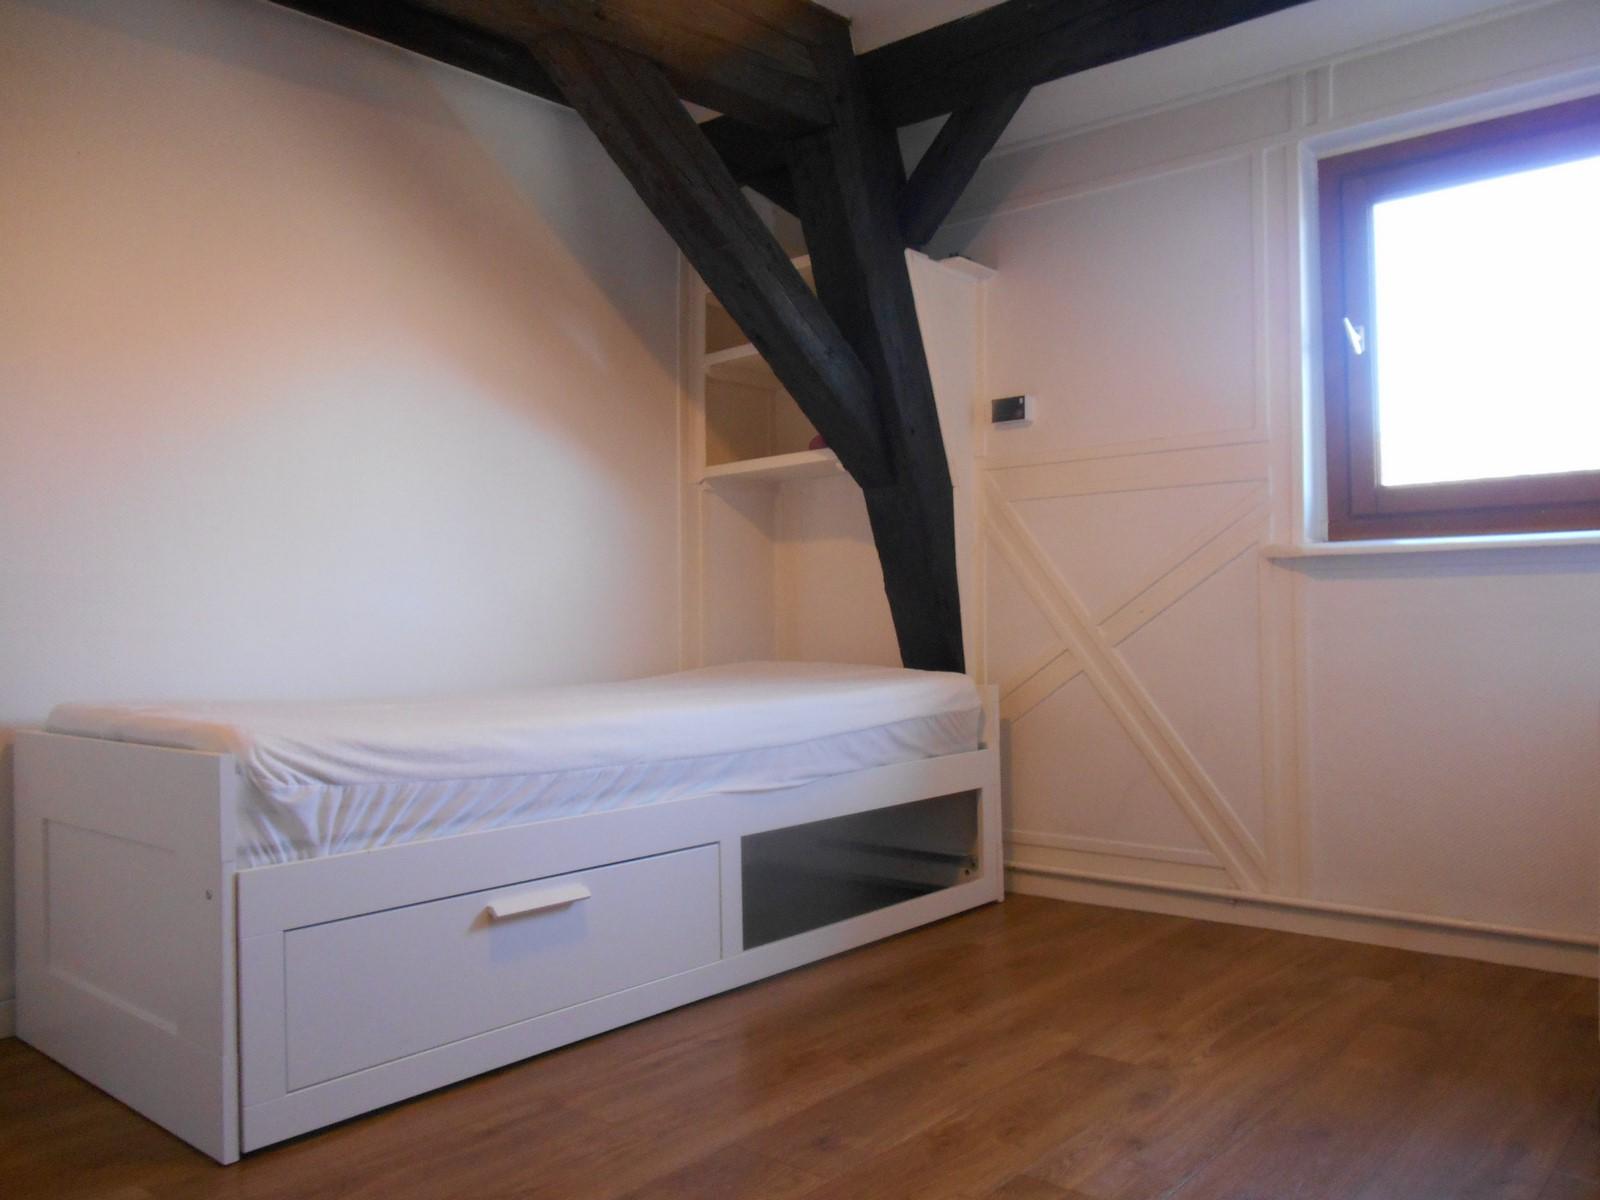 [LePetitMeunier] Studio - Petite France / rue des Moulins - nos locations - Beausite Immobilier 1